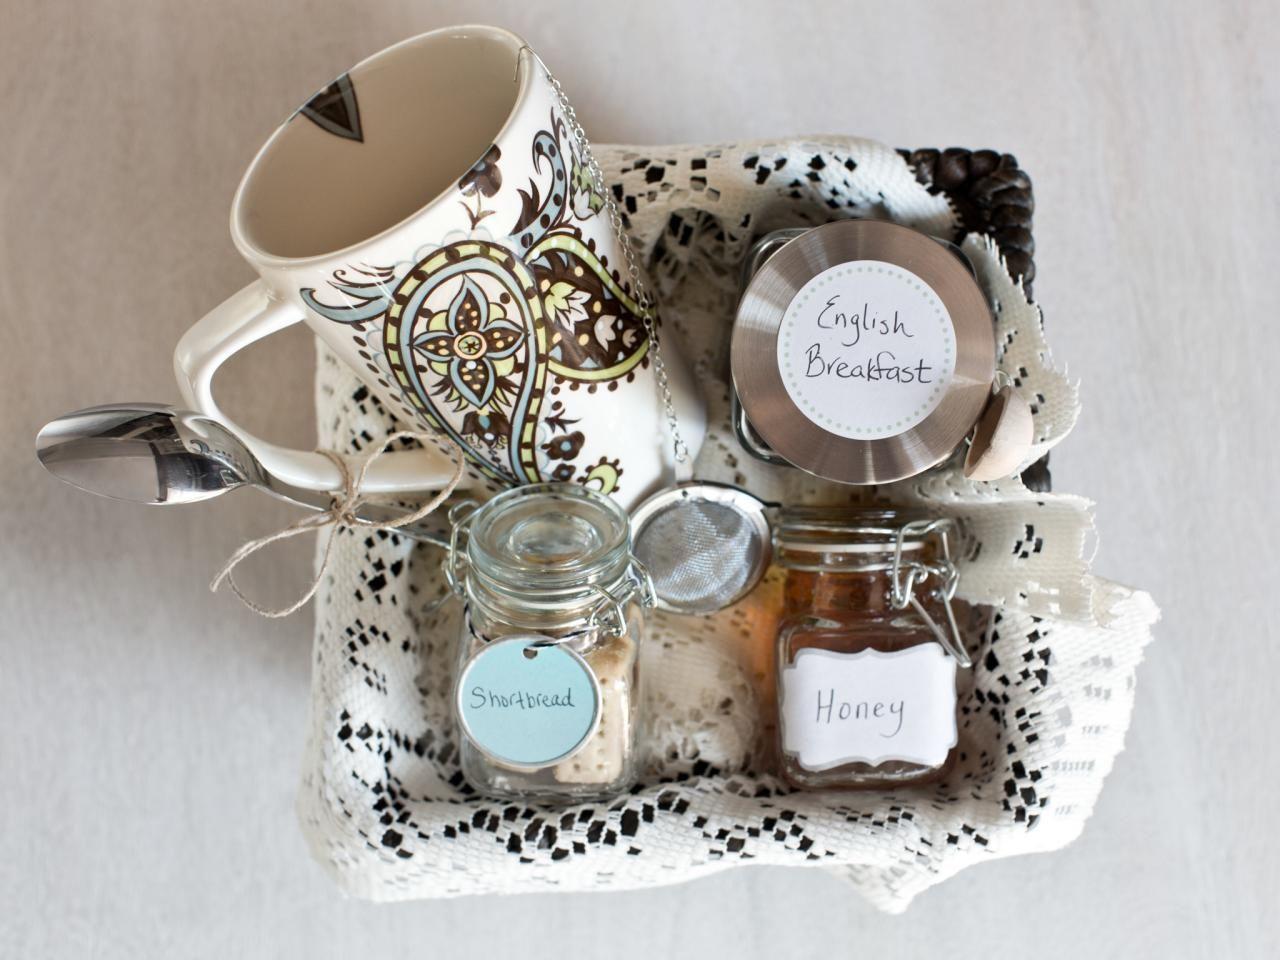 Christmas gift baskets tea gift baskets tea gifts